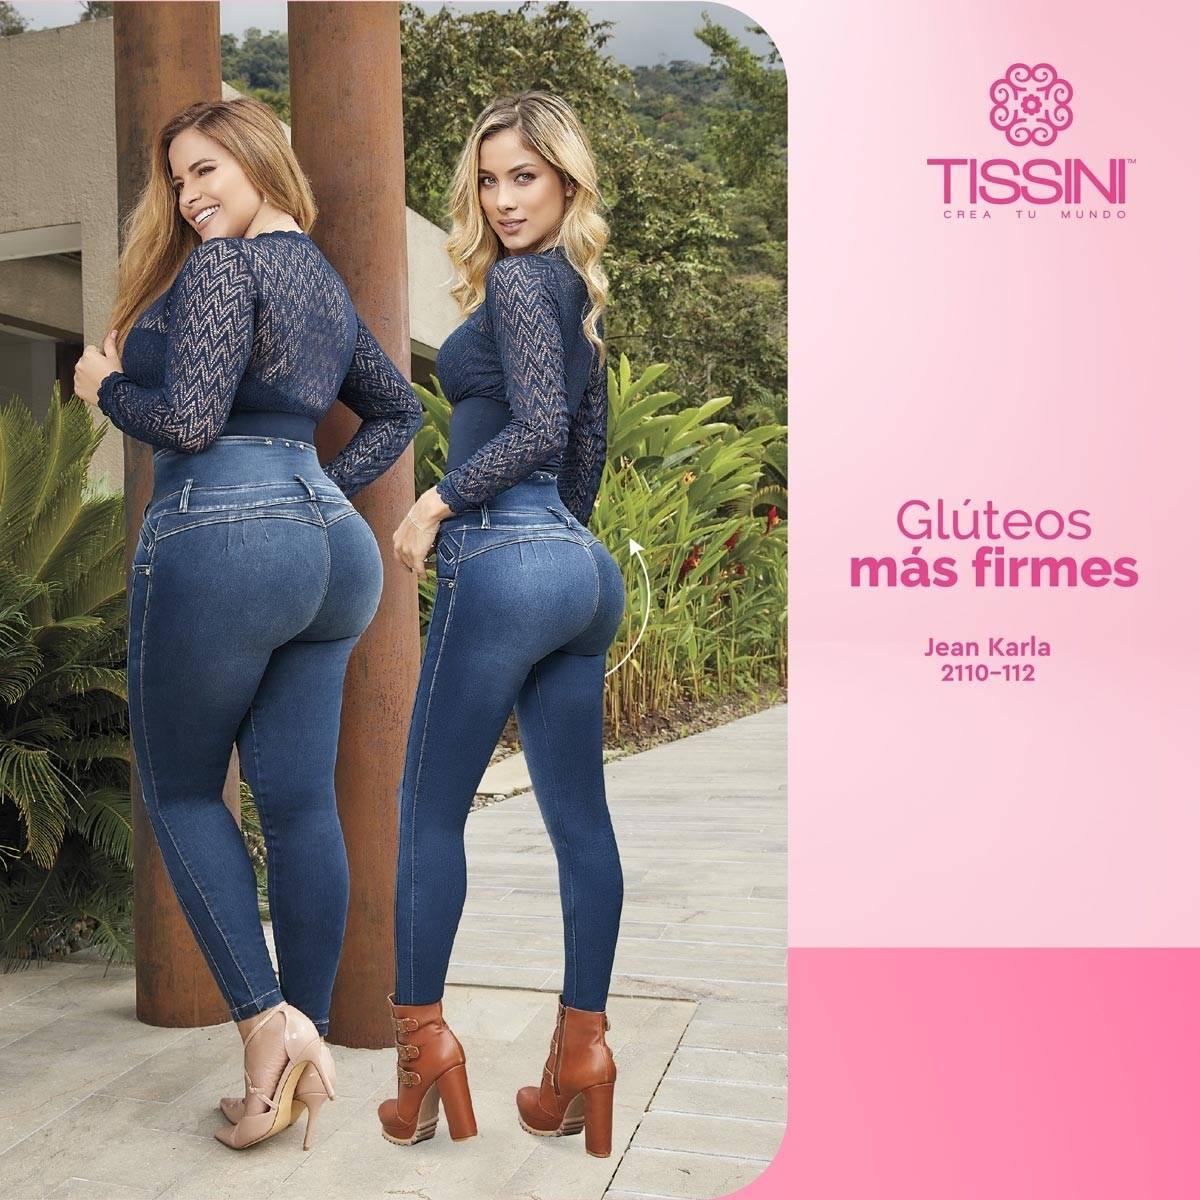 Productos jeans colombianos en USA